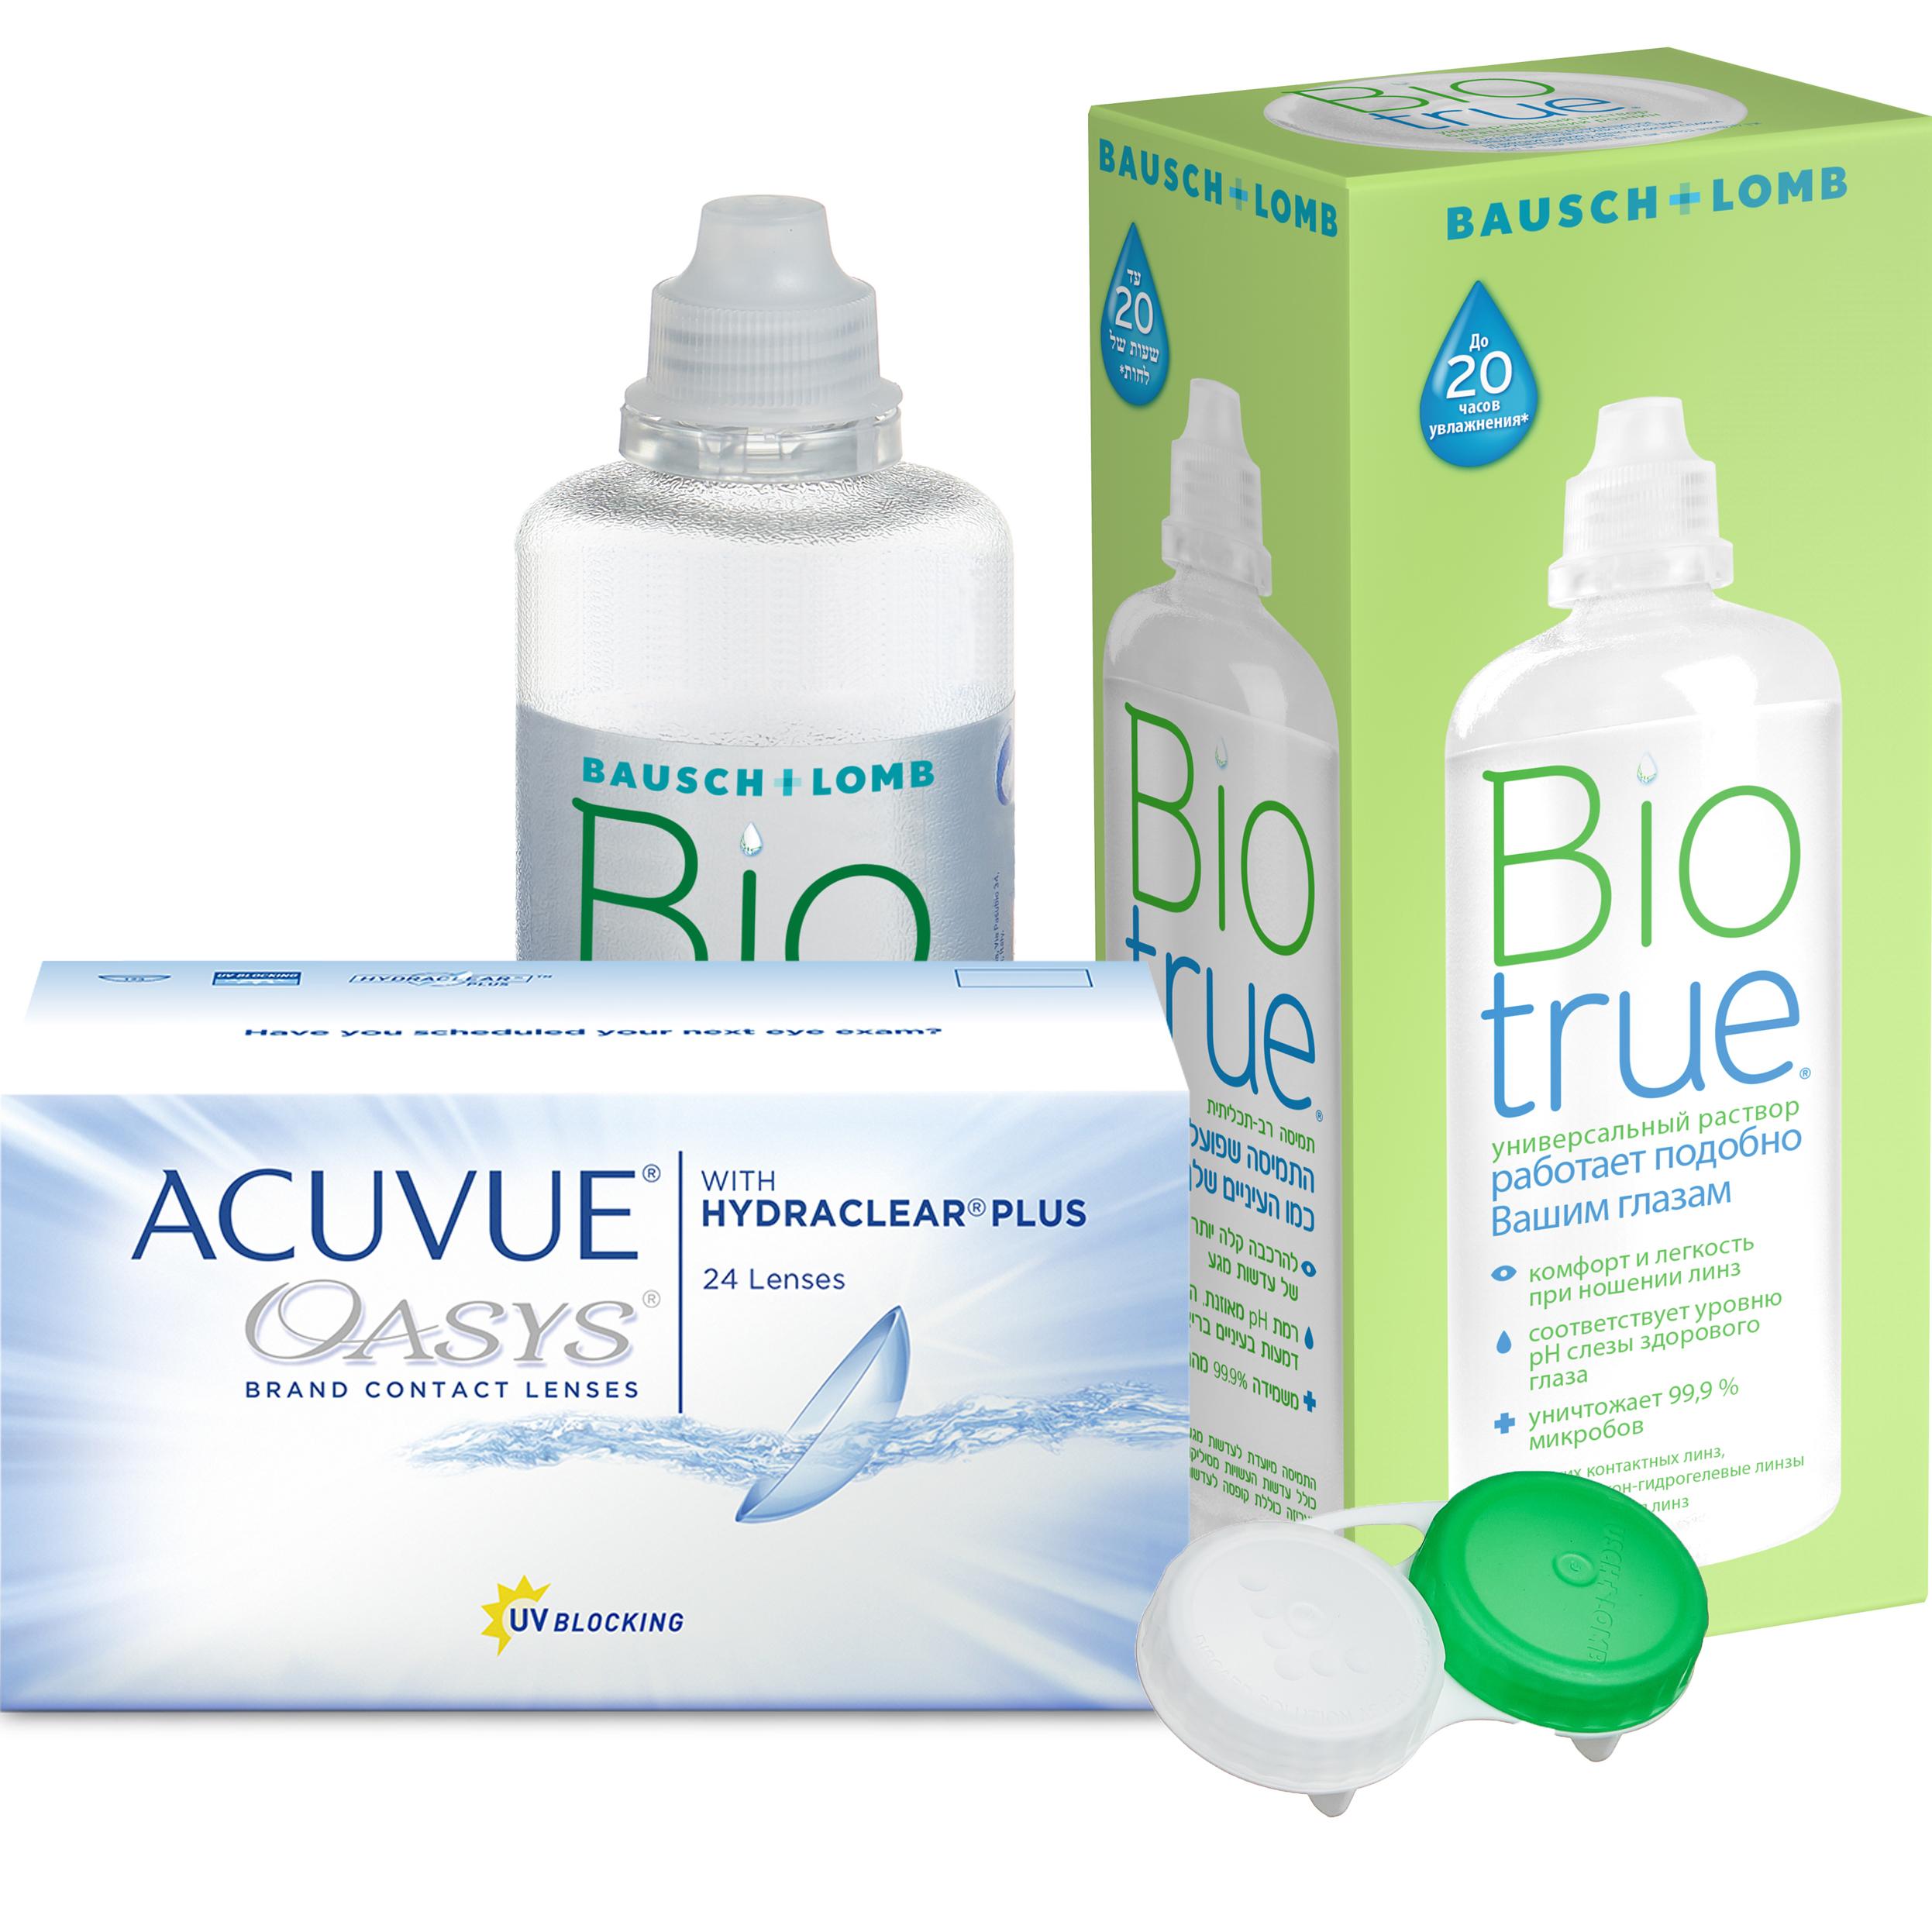 Купить Oasys with Hydraclear Plus 24 линзы + Biotrue, Контактные линзы Acuvue Oasys with Hydraclear Plus 24 линзы R 8.4 +5, 75 + Biotrue 300 мл